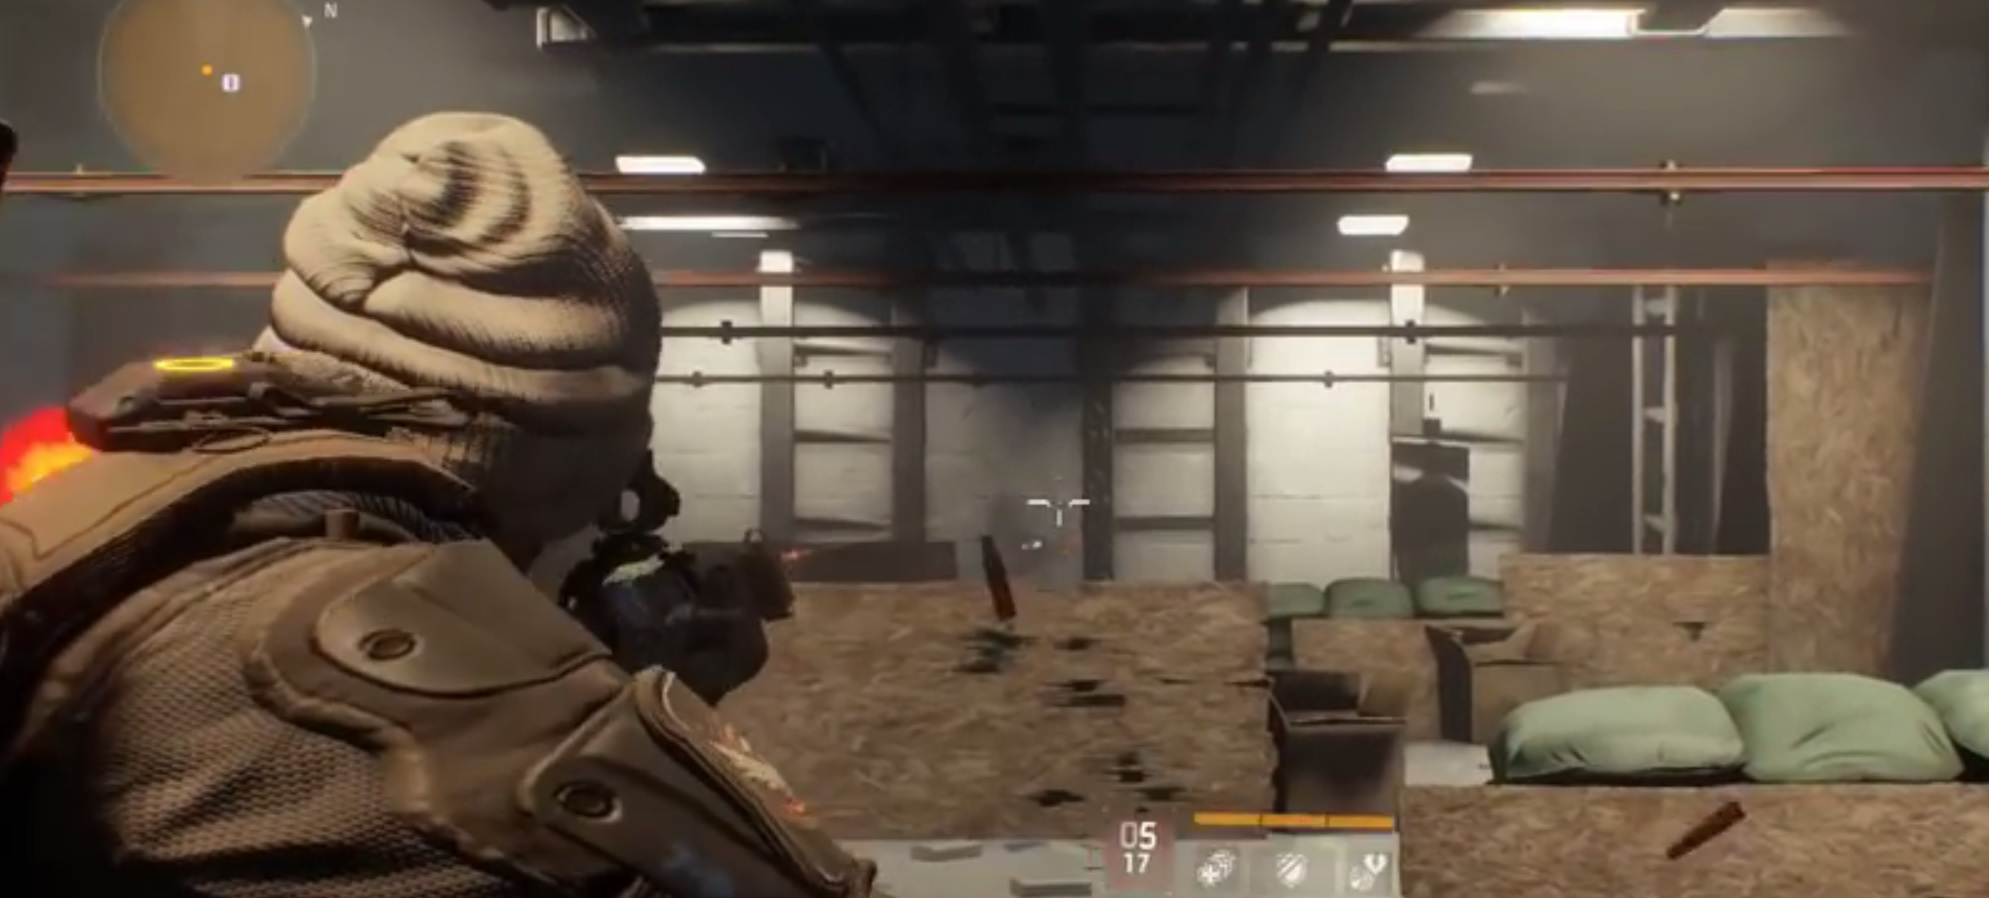 division-paratrooper-svd-schuss